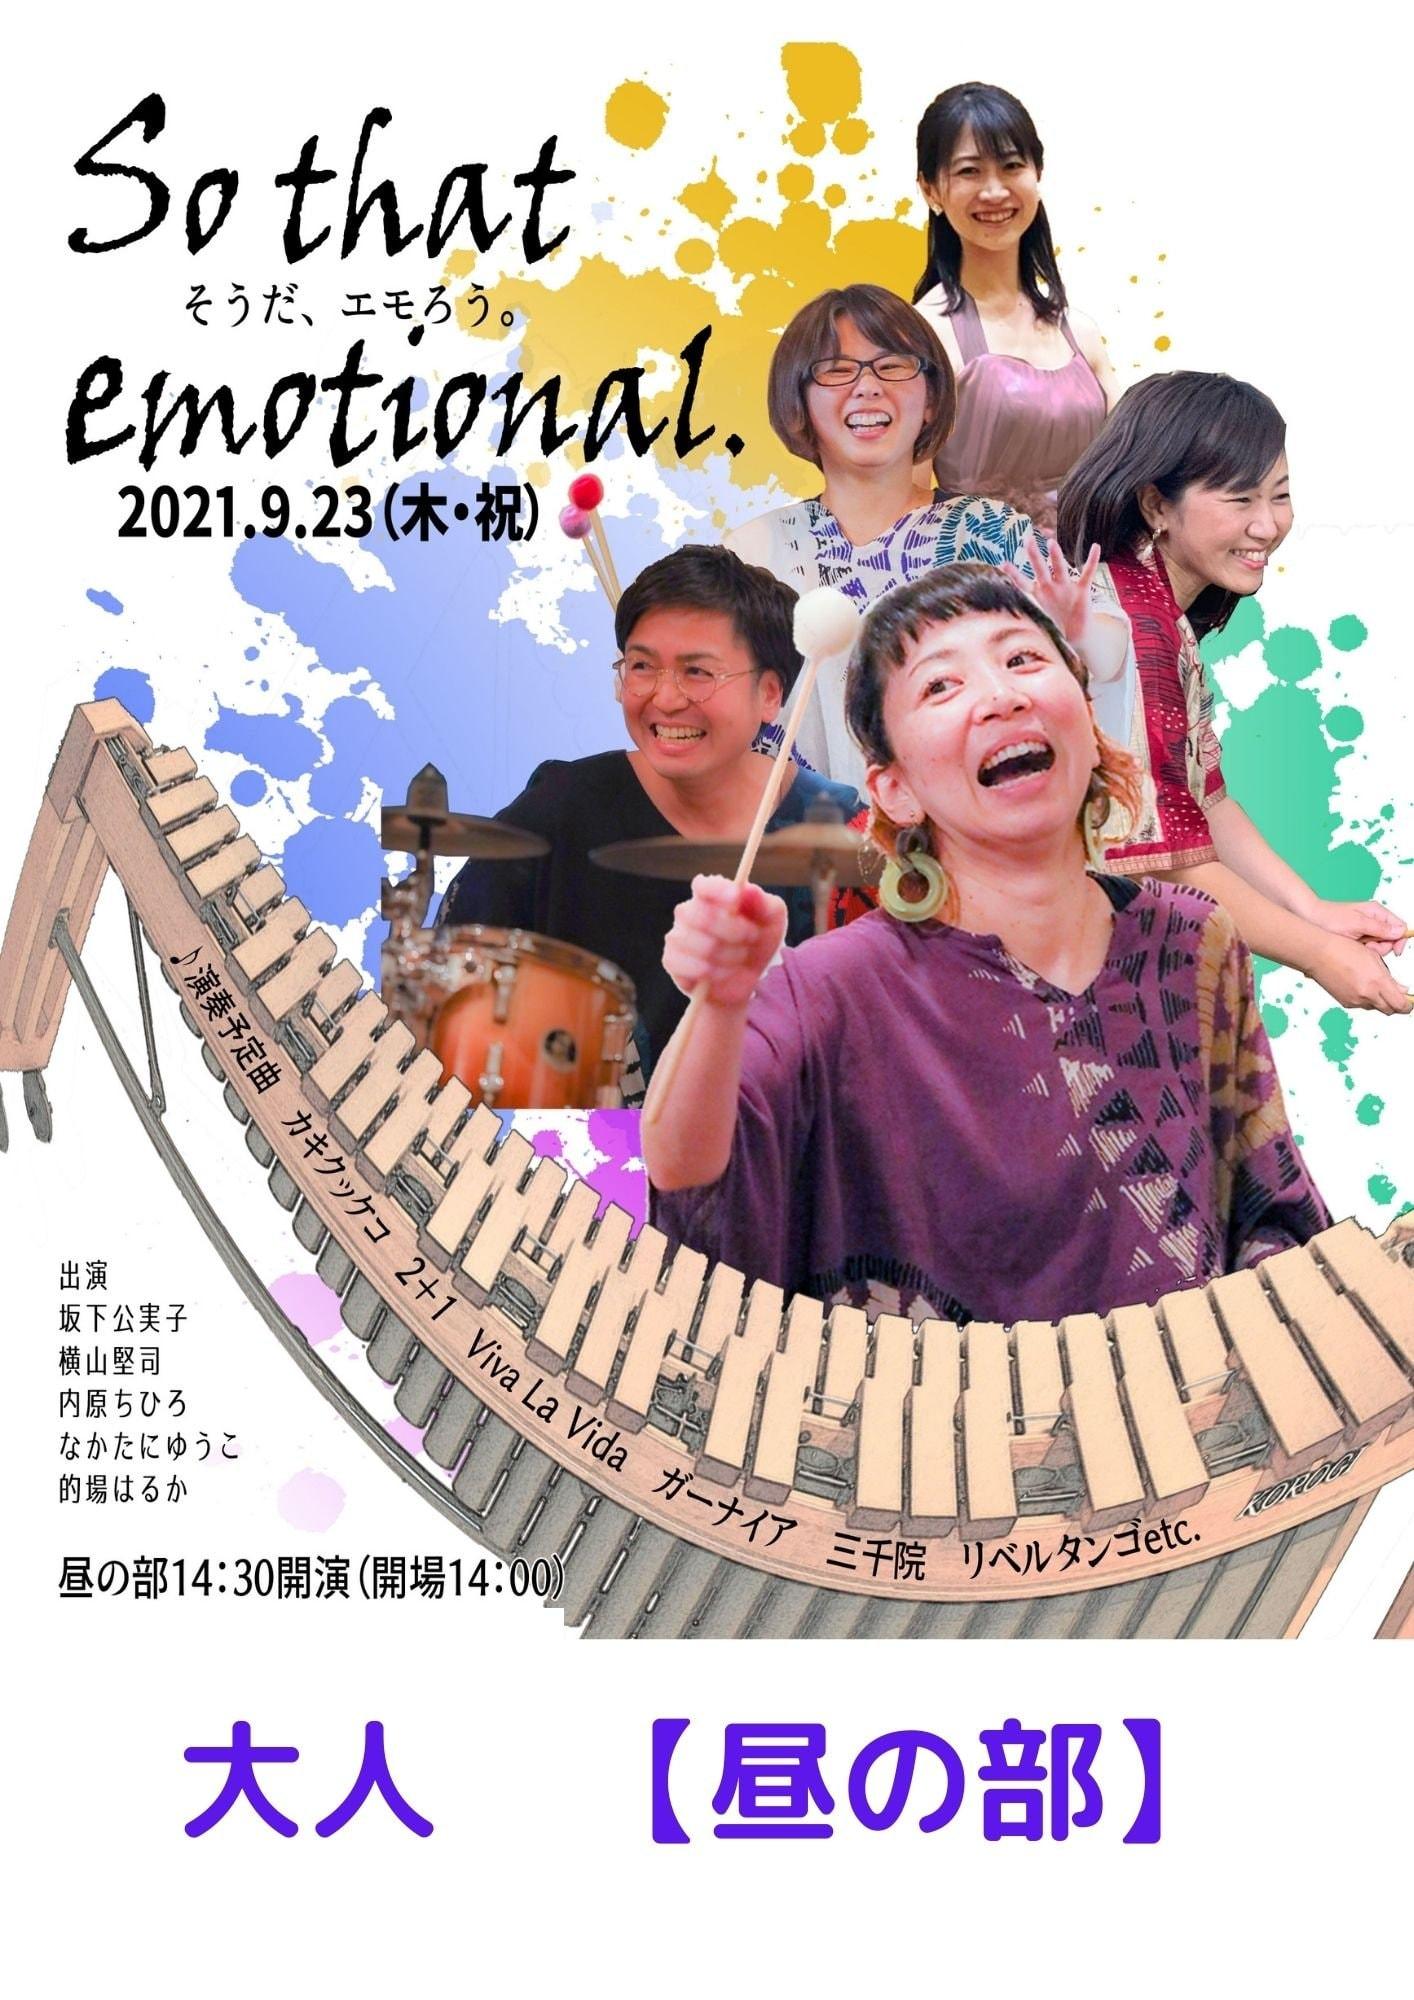 So that emotional 2021.9.23 大人 【昼の部】中学生以上のイメージその1